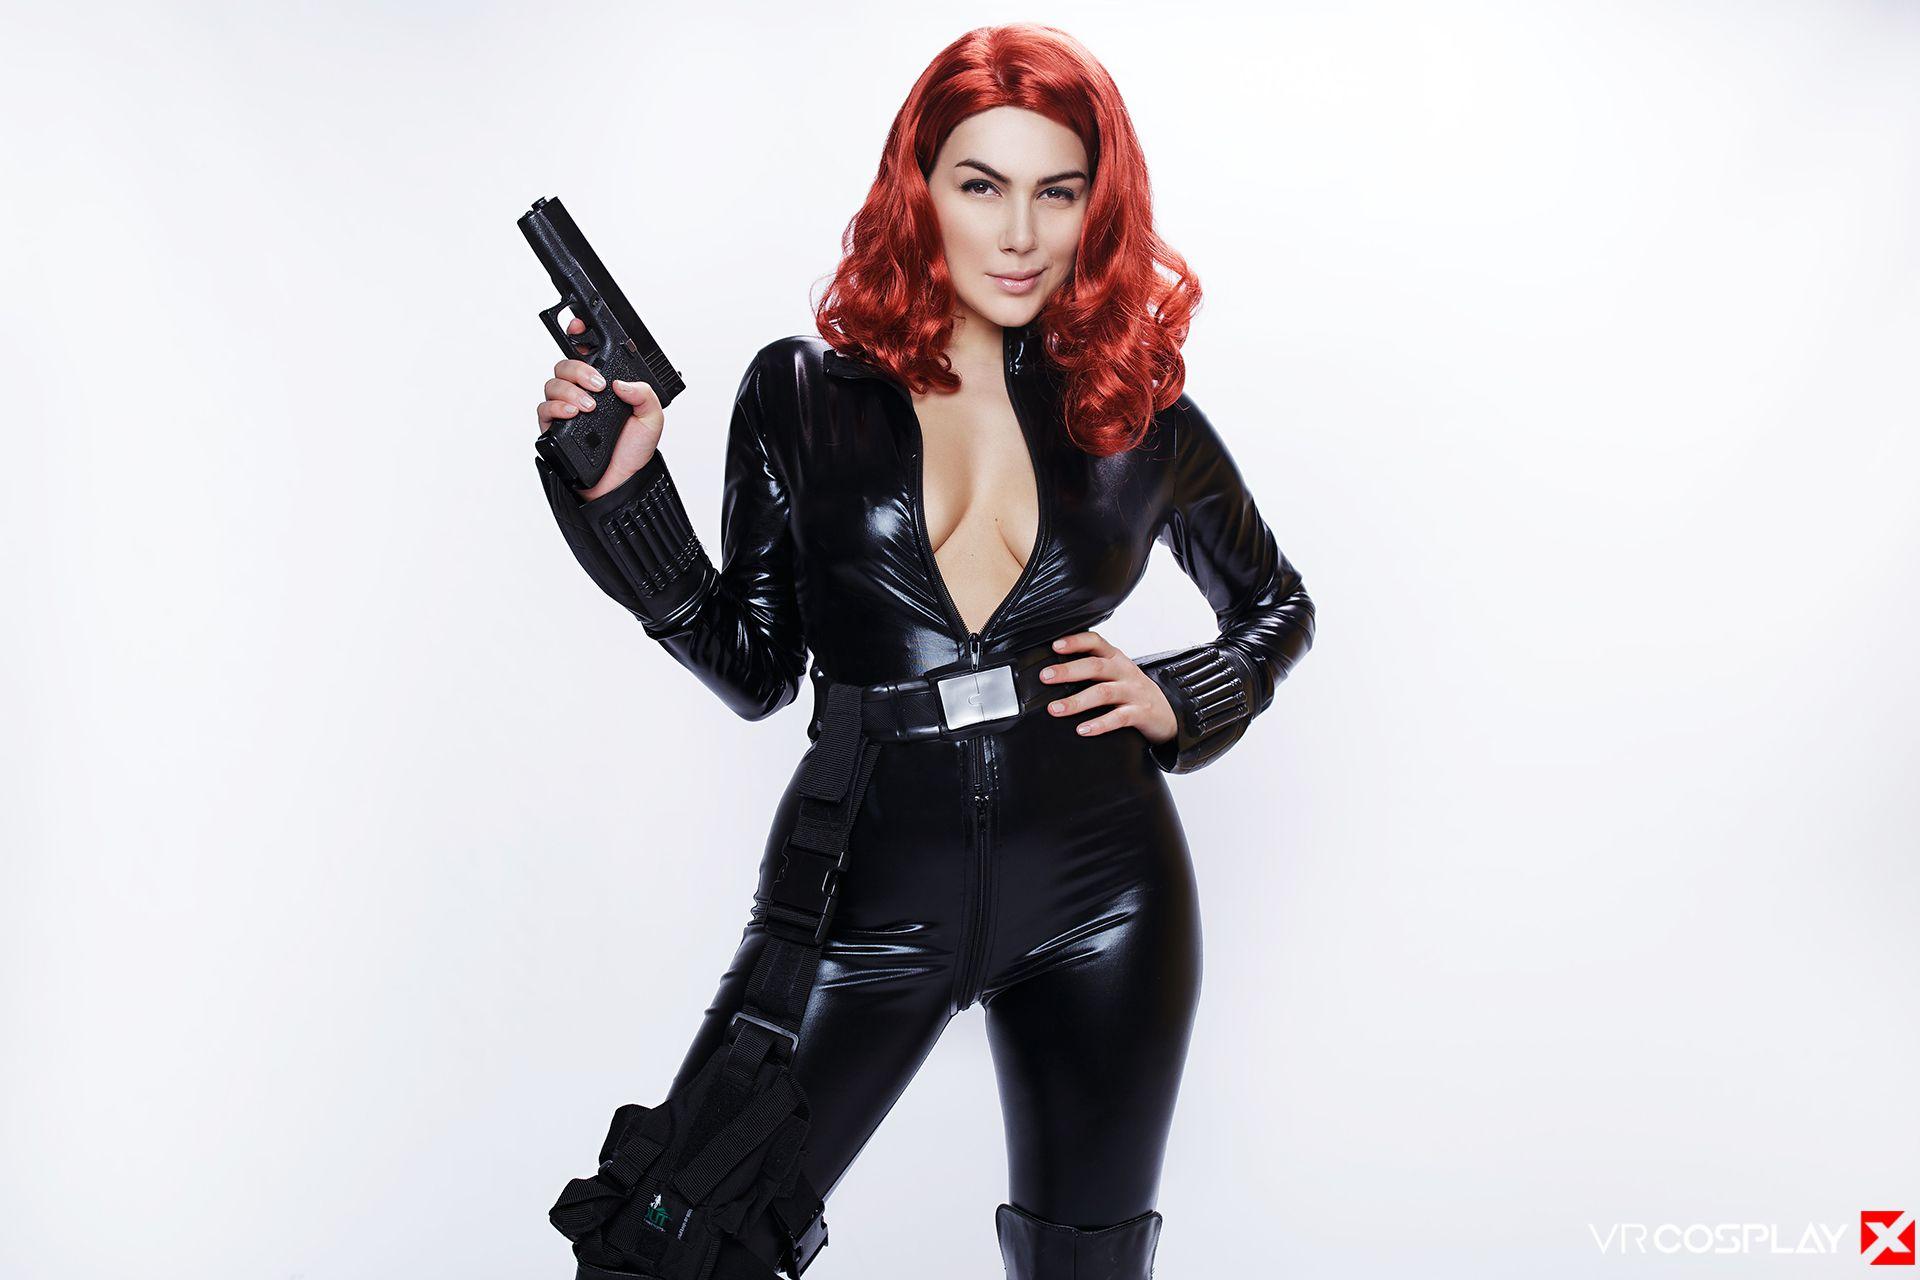 Gina Valentina Valentina Nappi